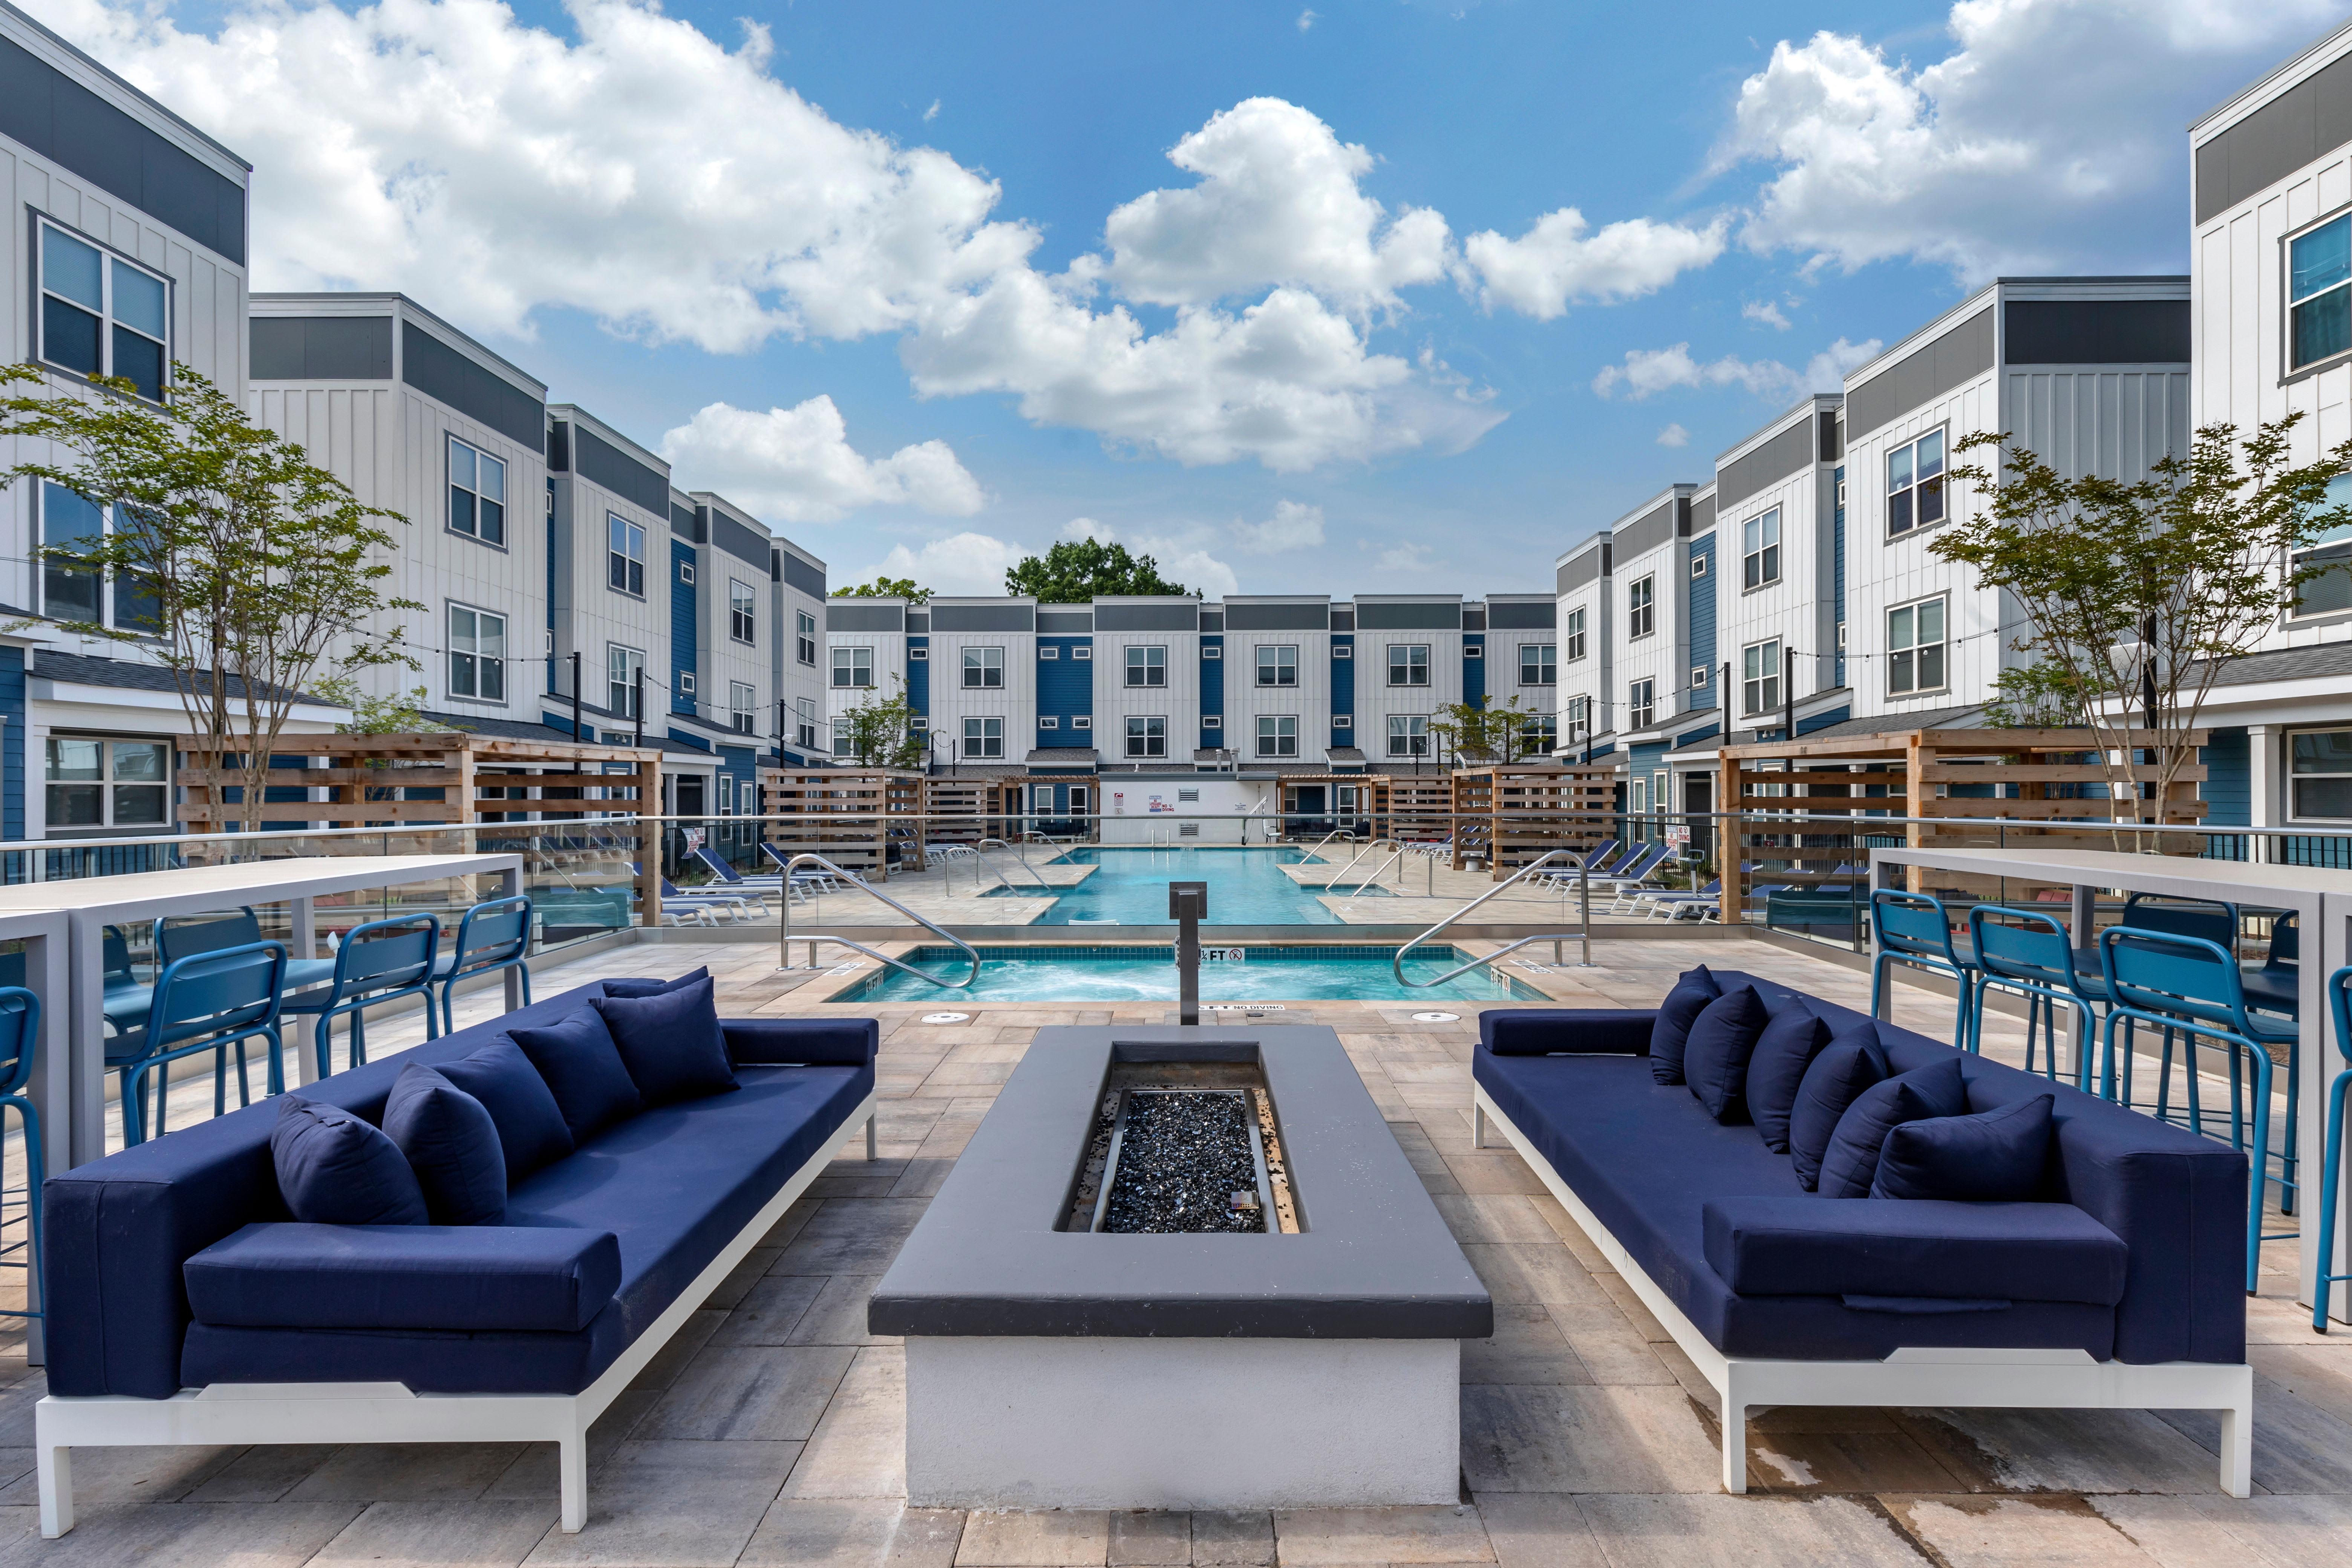 Resort-style swimming pool lounge seating at LATITUDE on Hillsborough in Raleigh, North Carolina